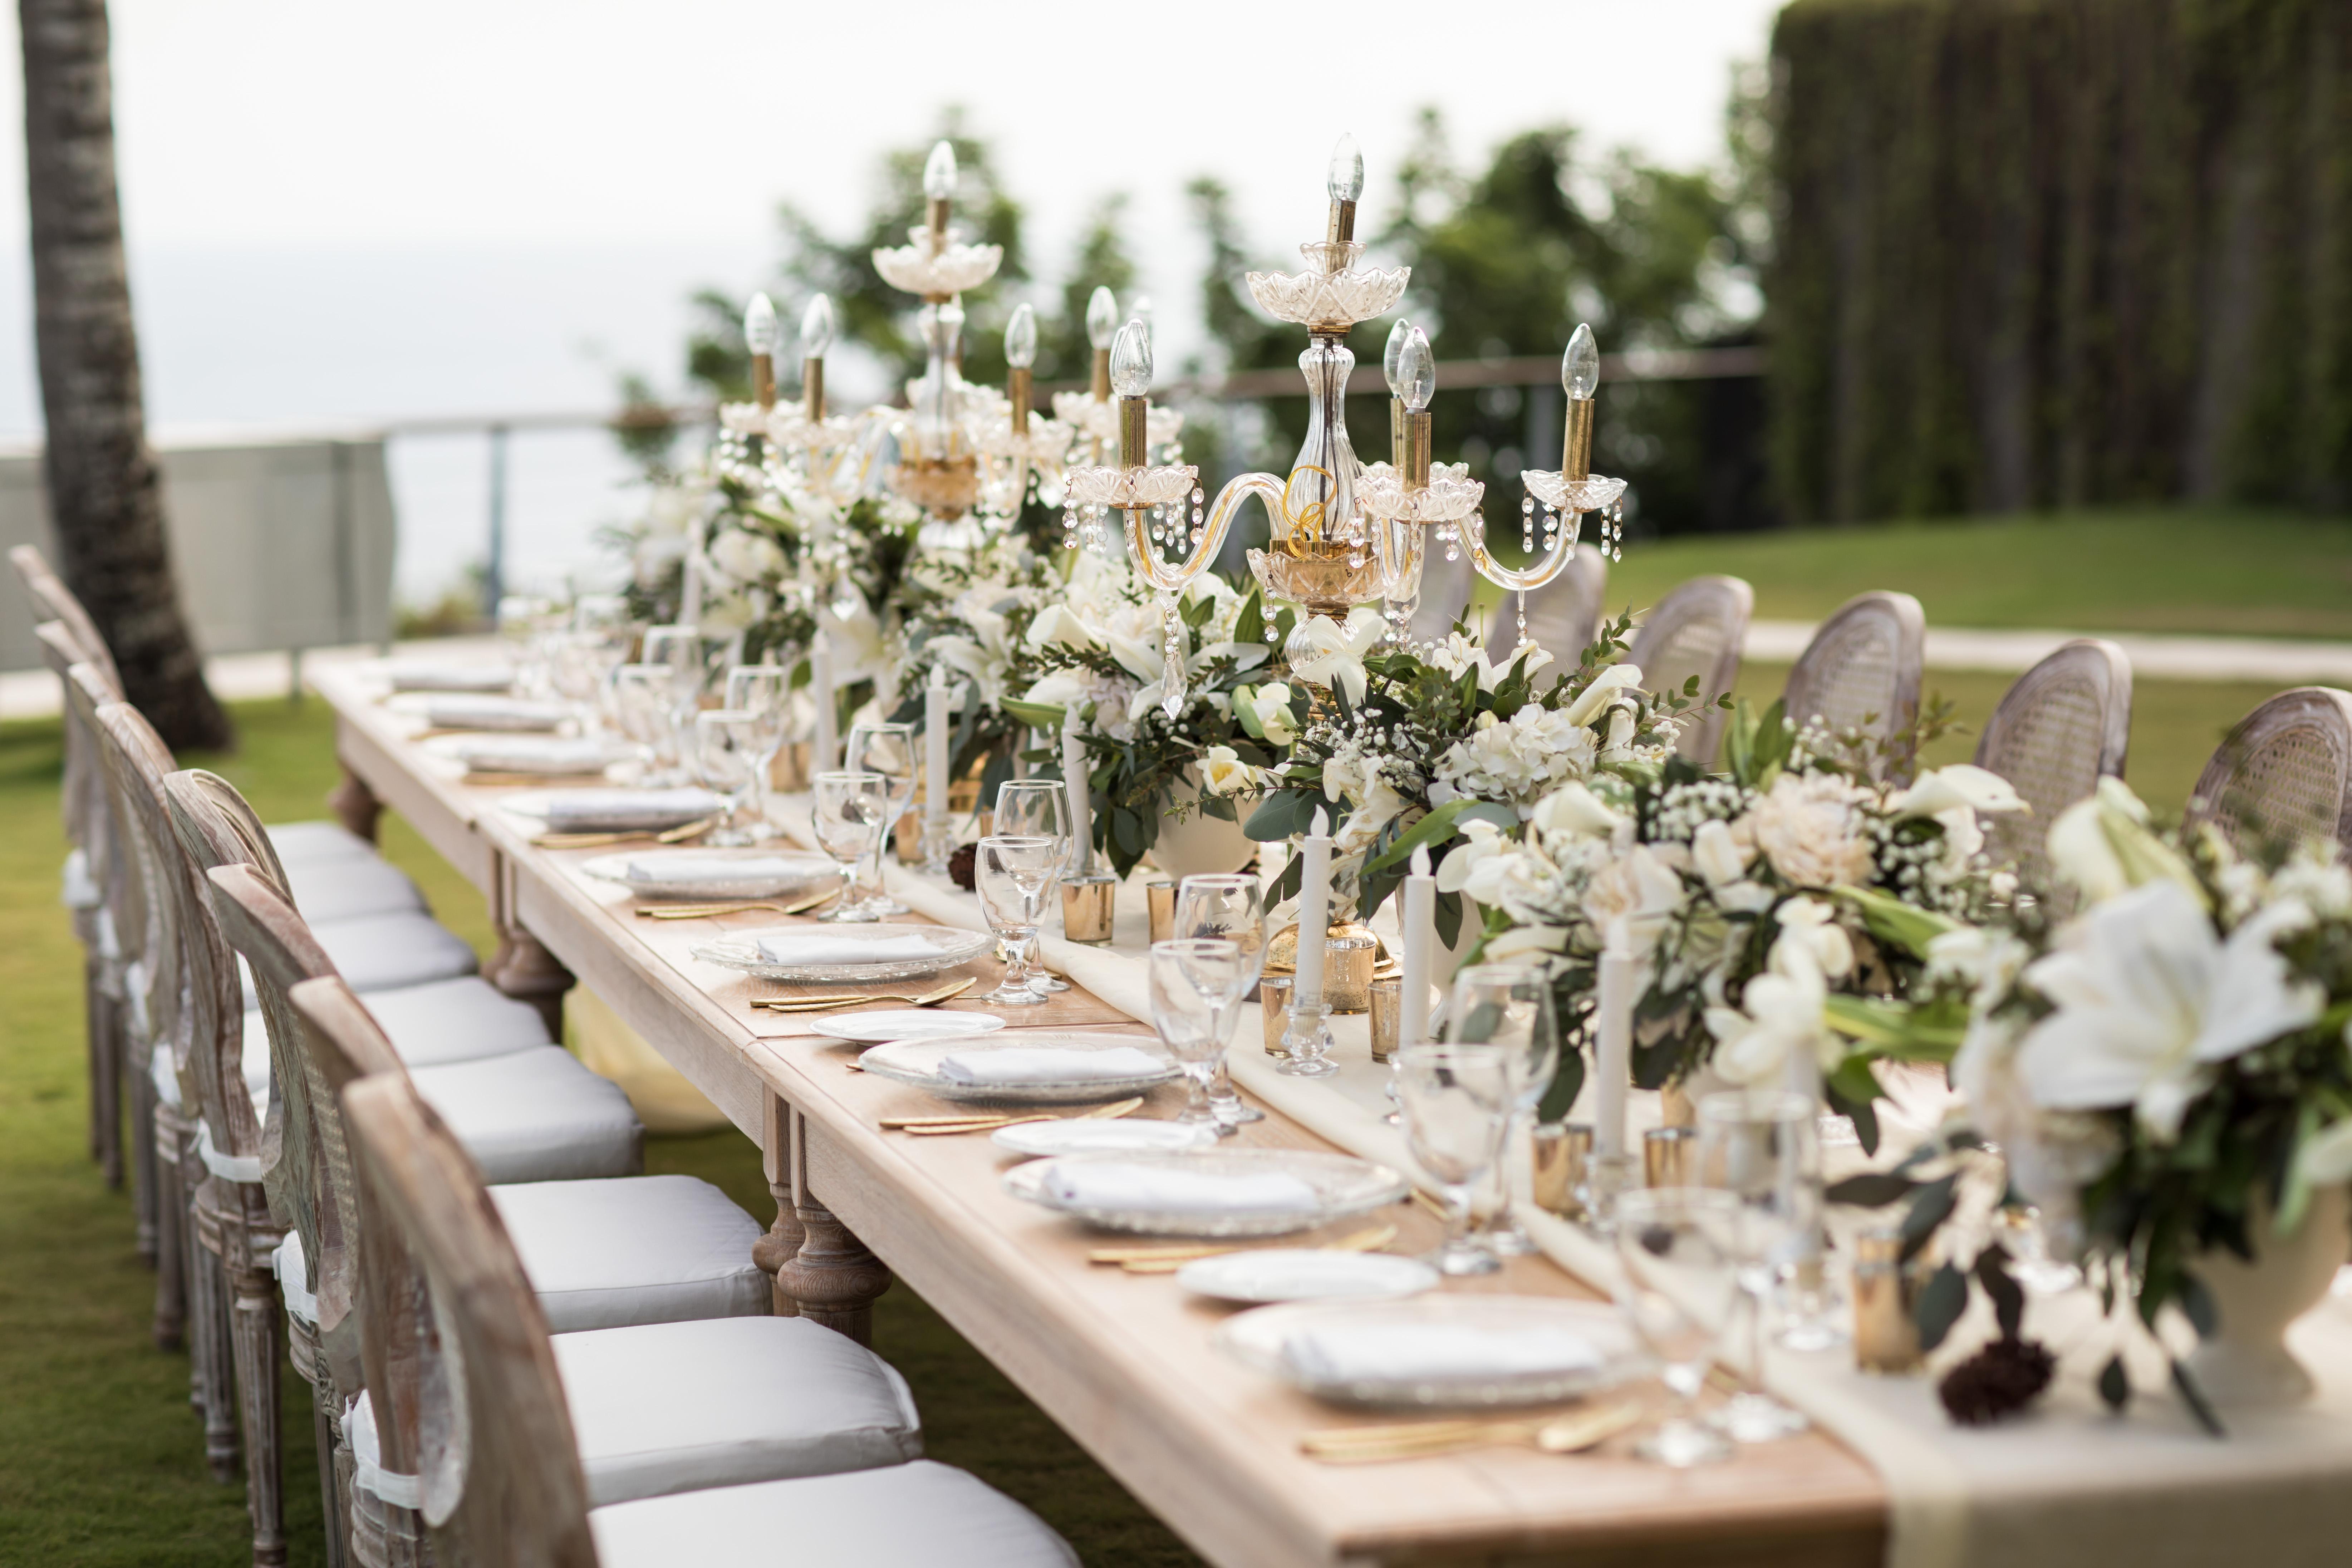 Best Bali clifftop wedding venue